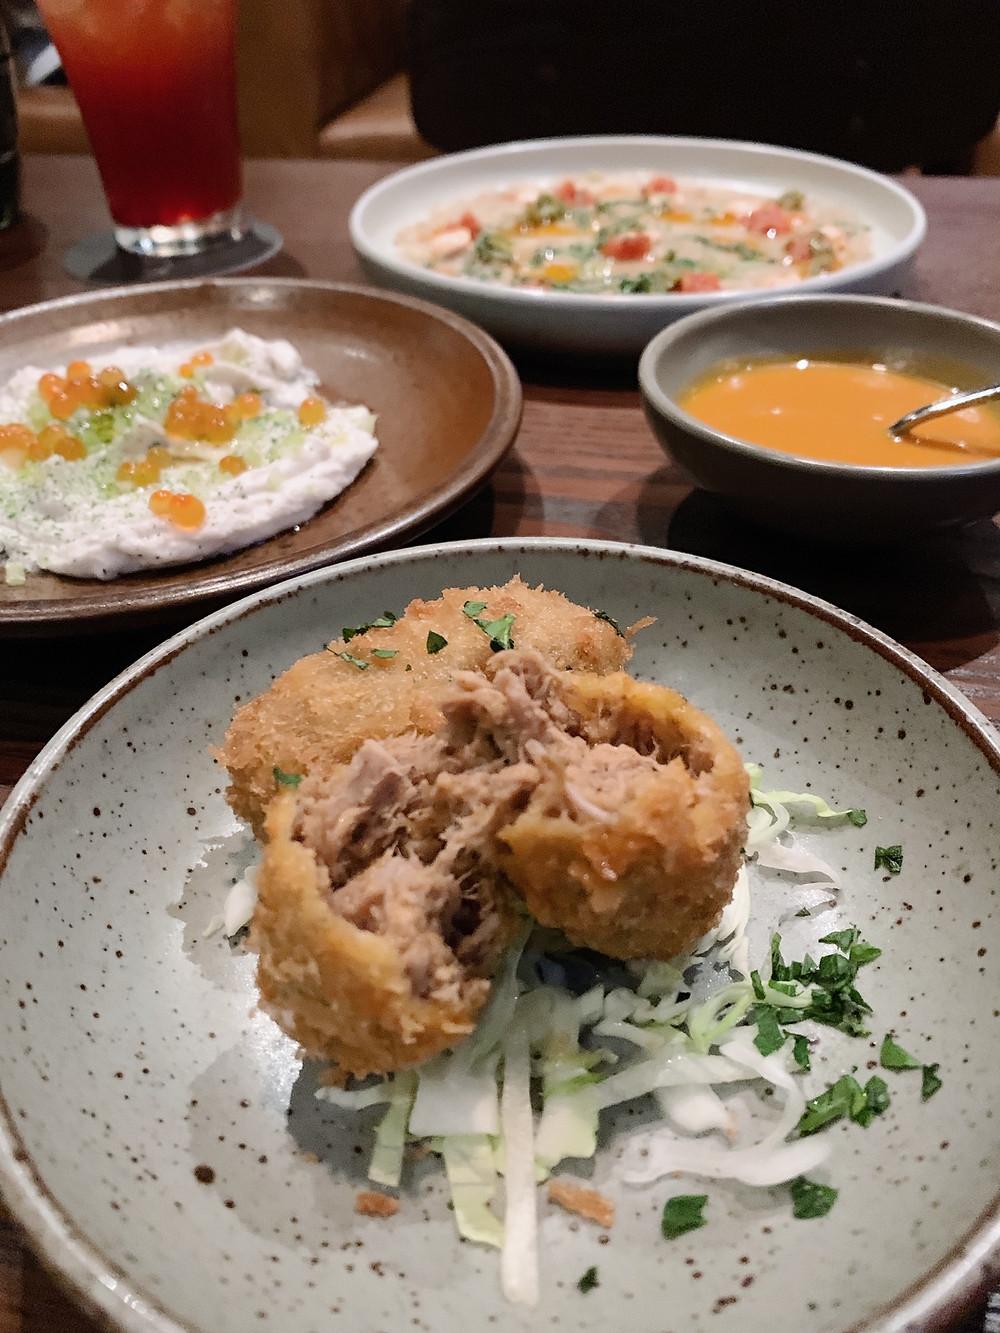 Food at Mr Brown grill restaurant in Hong Kong